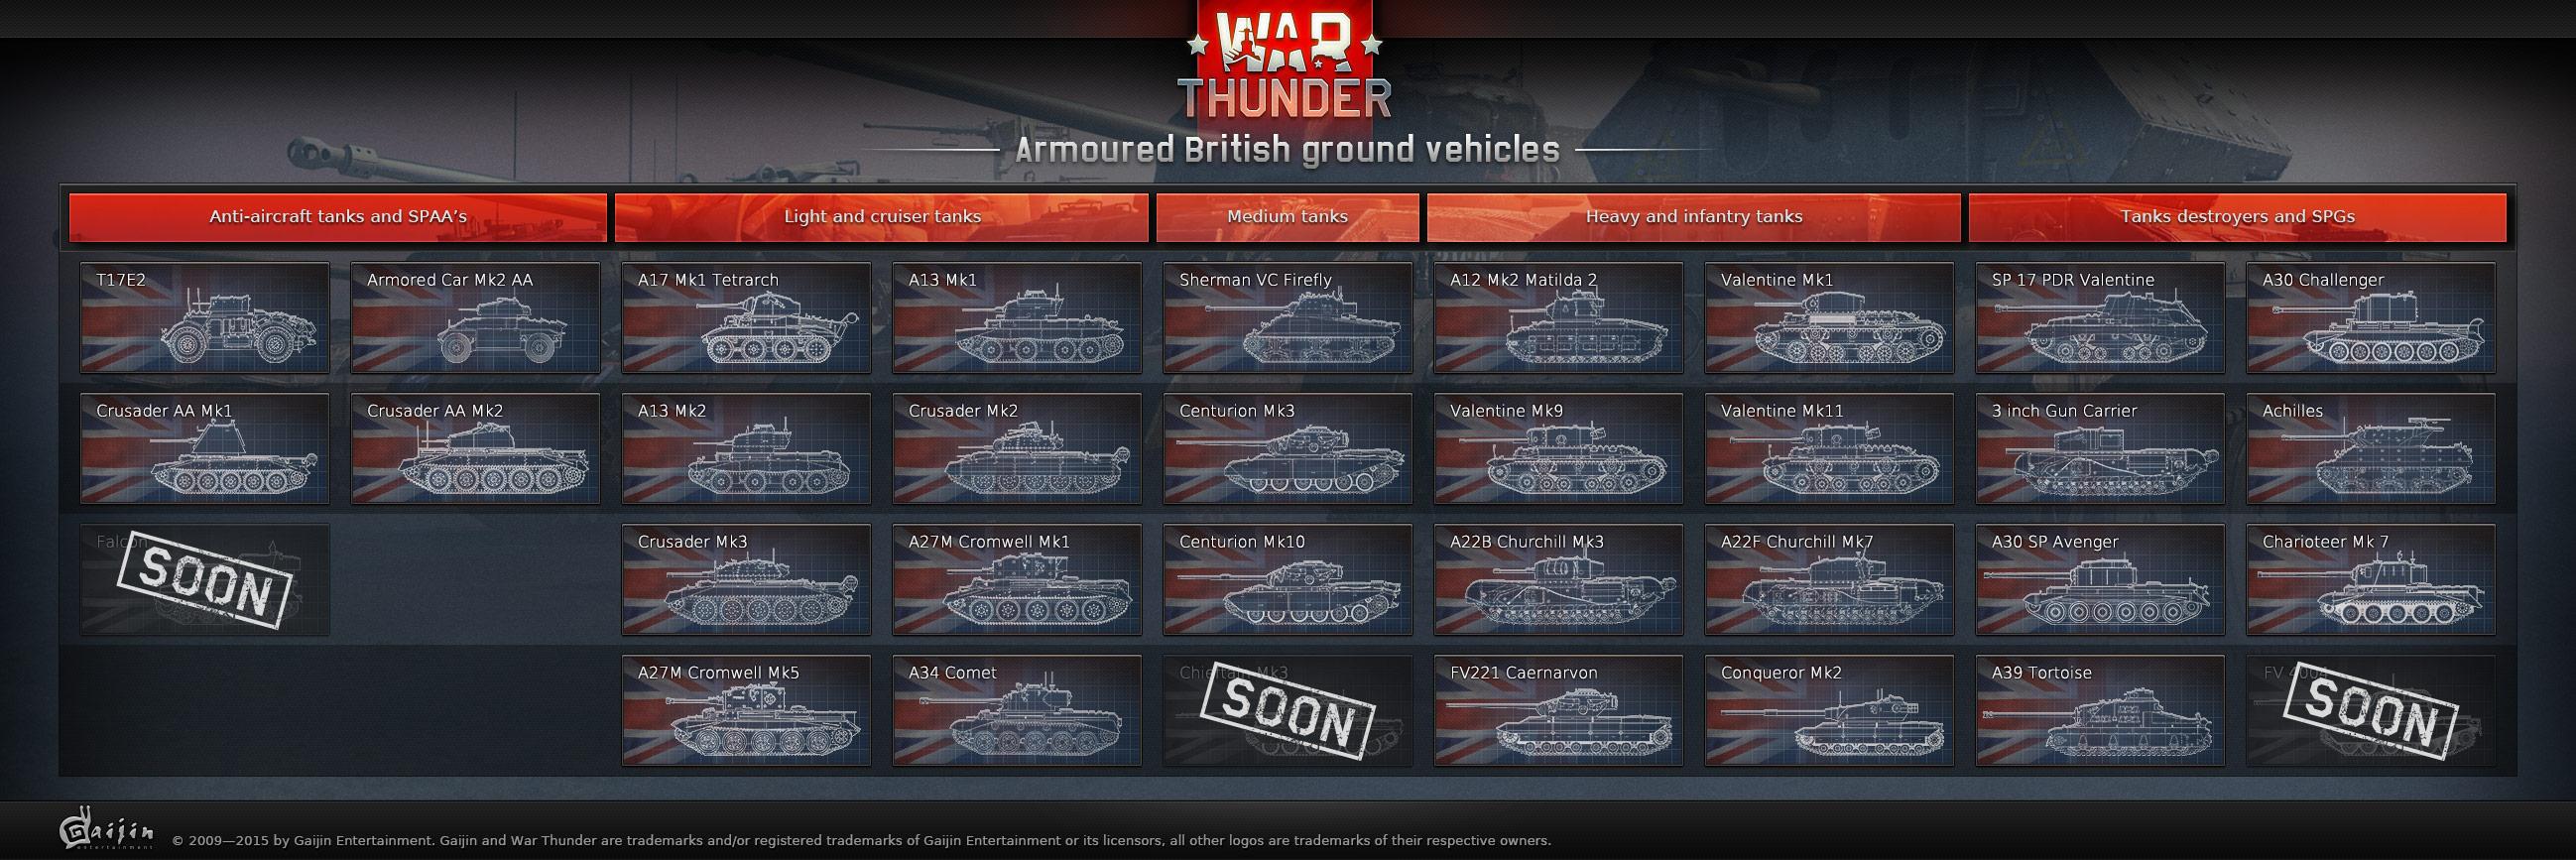 http://static.warthunder.com/upload/image/!%202015%20NEWS/December/Three/uk_tank_tree_eng_01.jpg